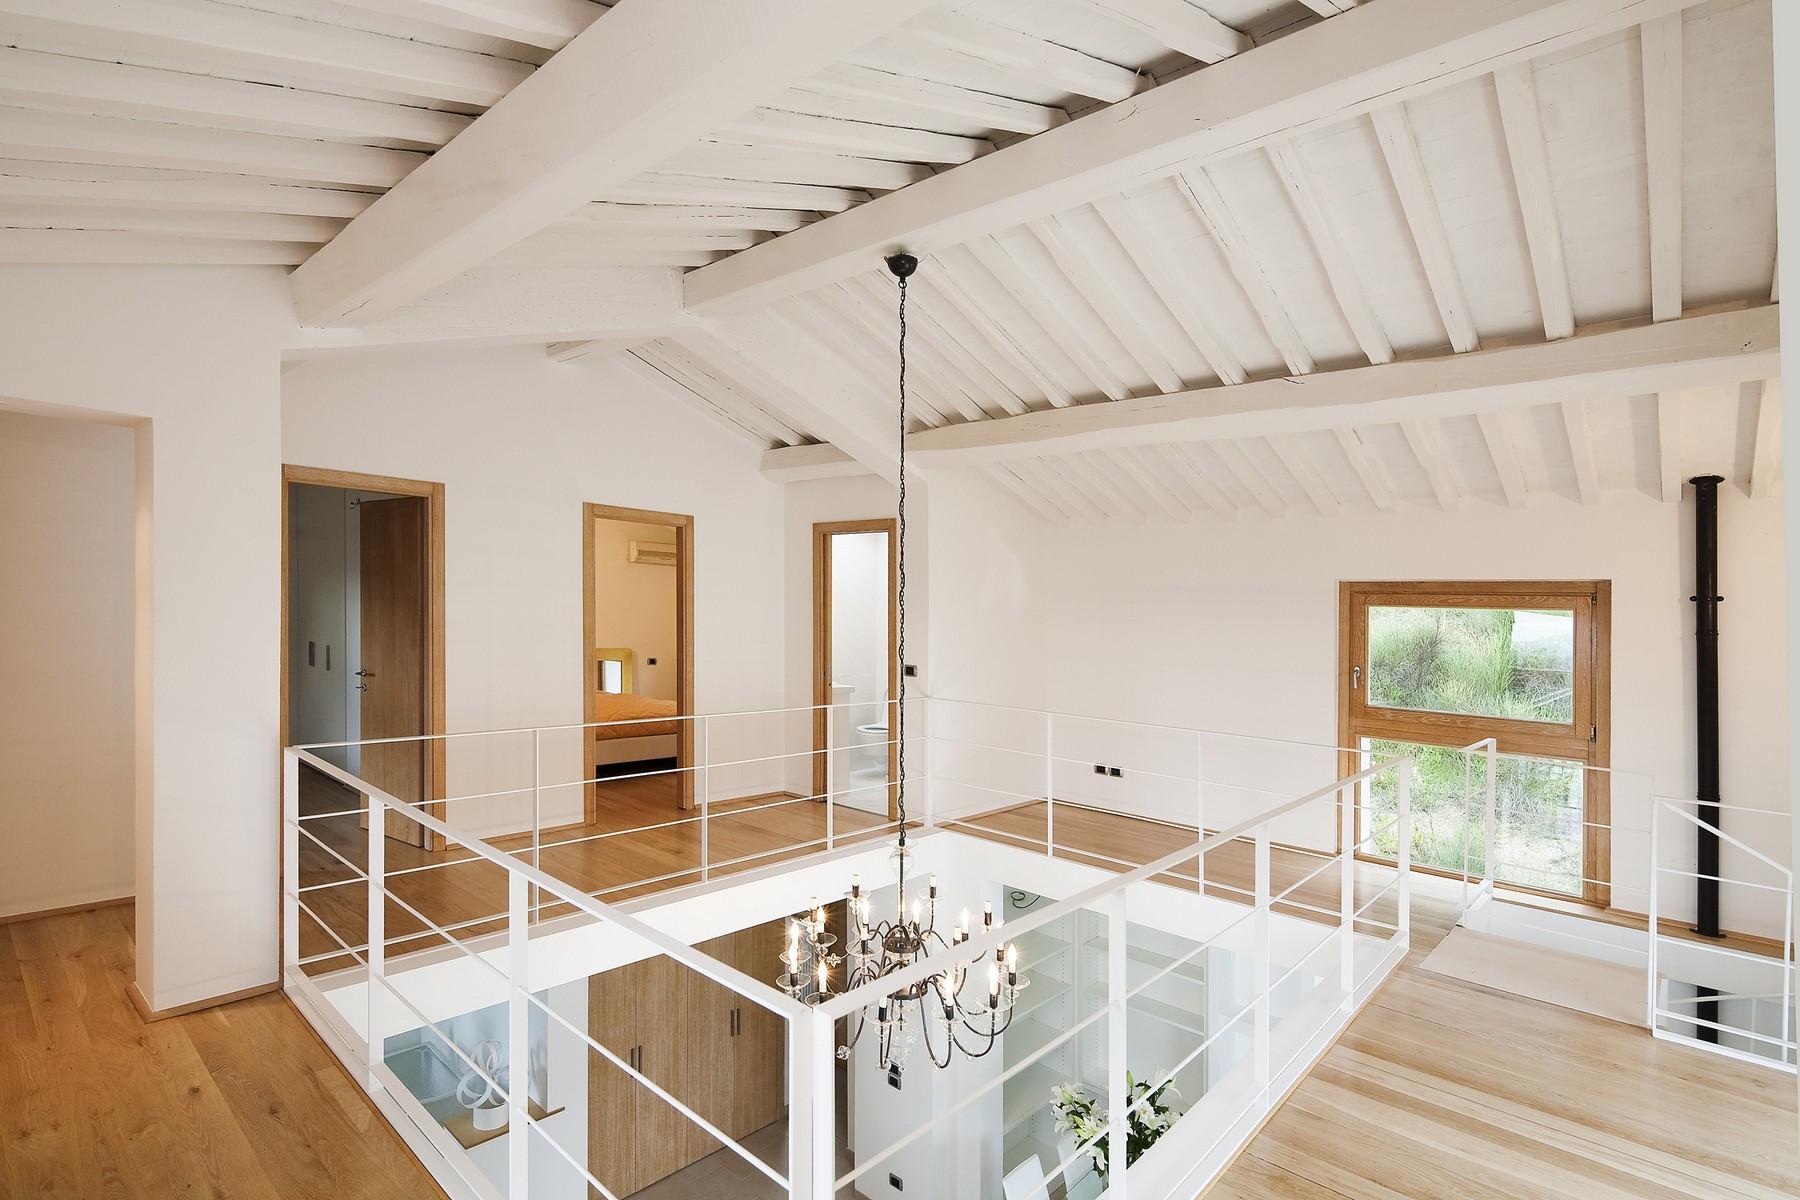 Additional photo for property listing at Design house overlooking Perugia Montelaguardia Perugia, Perugia 06135 Italia